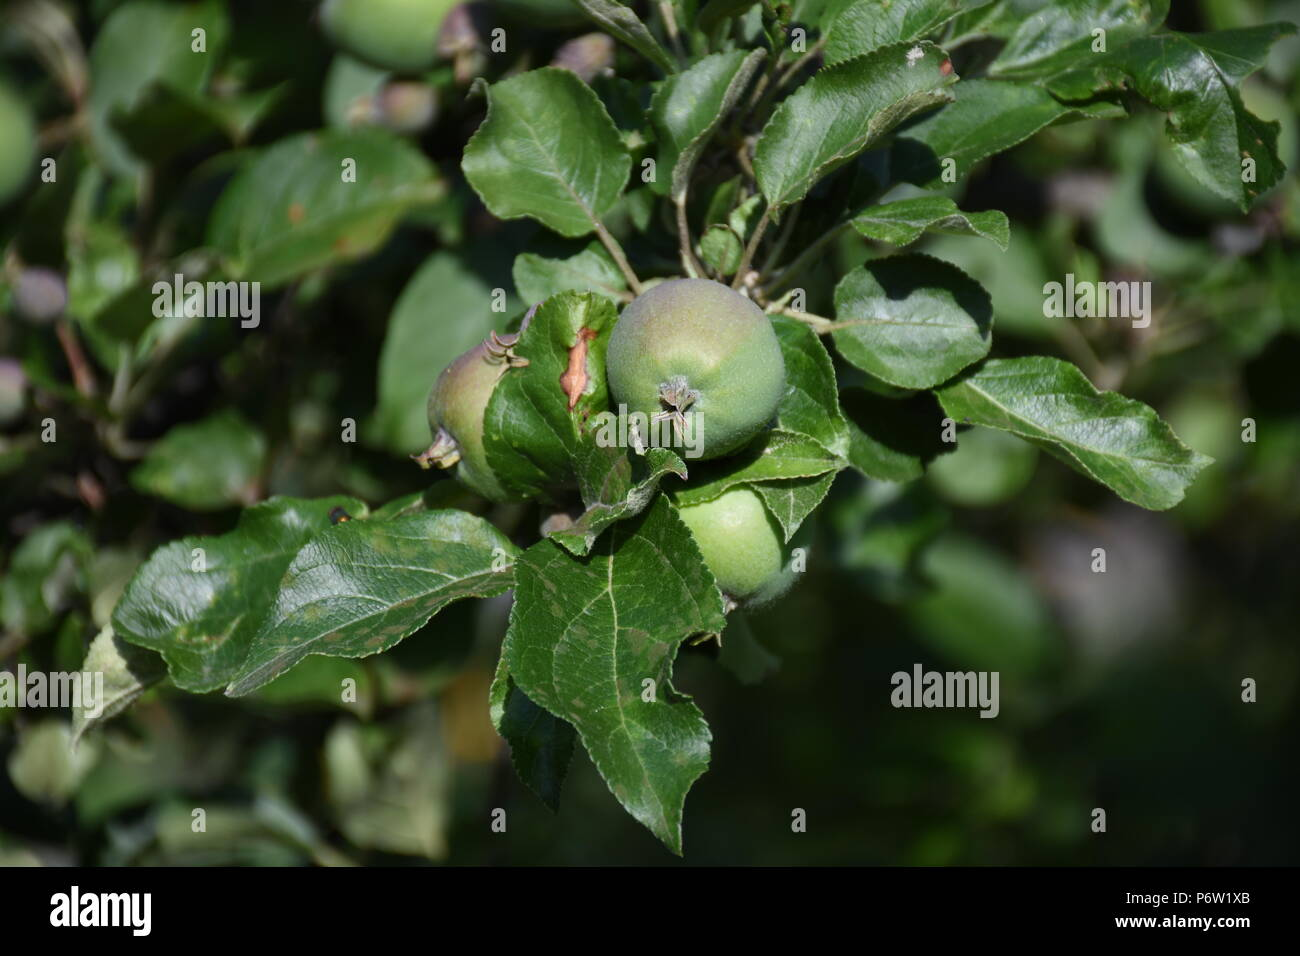 Äpfel auf einem Apfelbaum - Stock Image